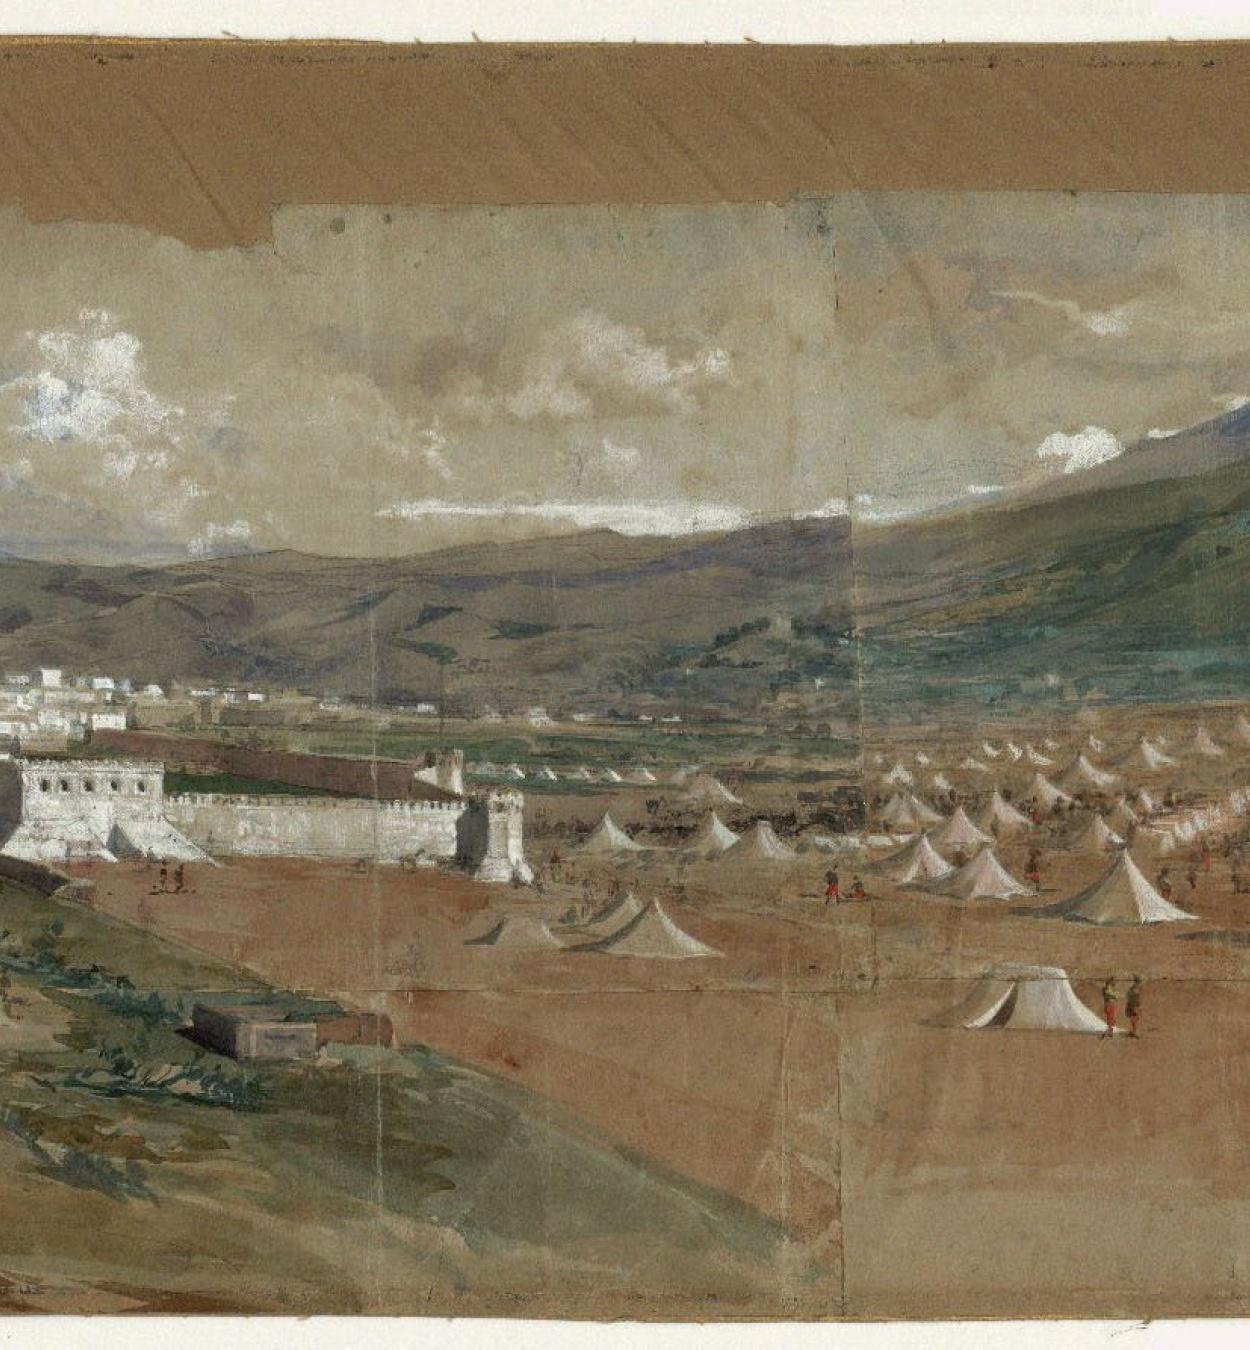 Marià Fortuny - View of Tetouan - 1860